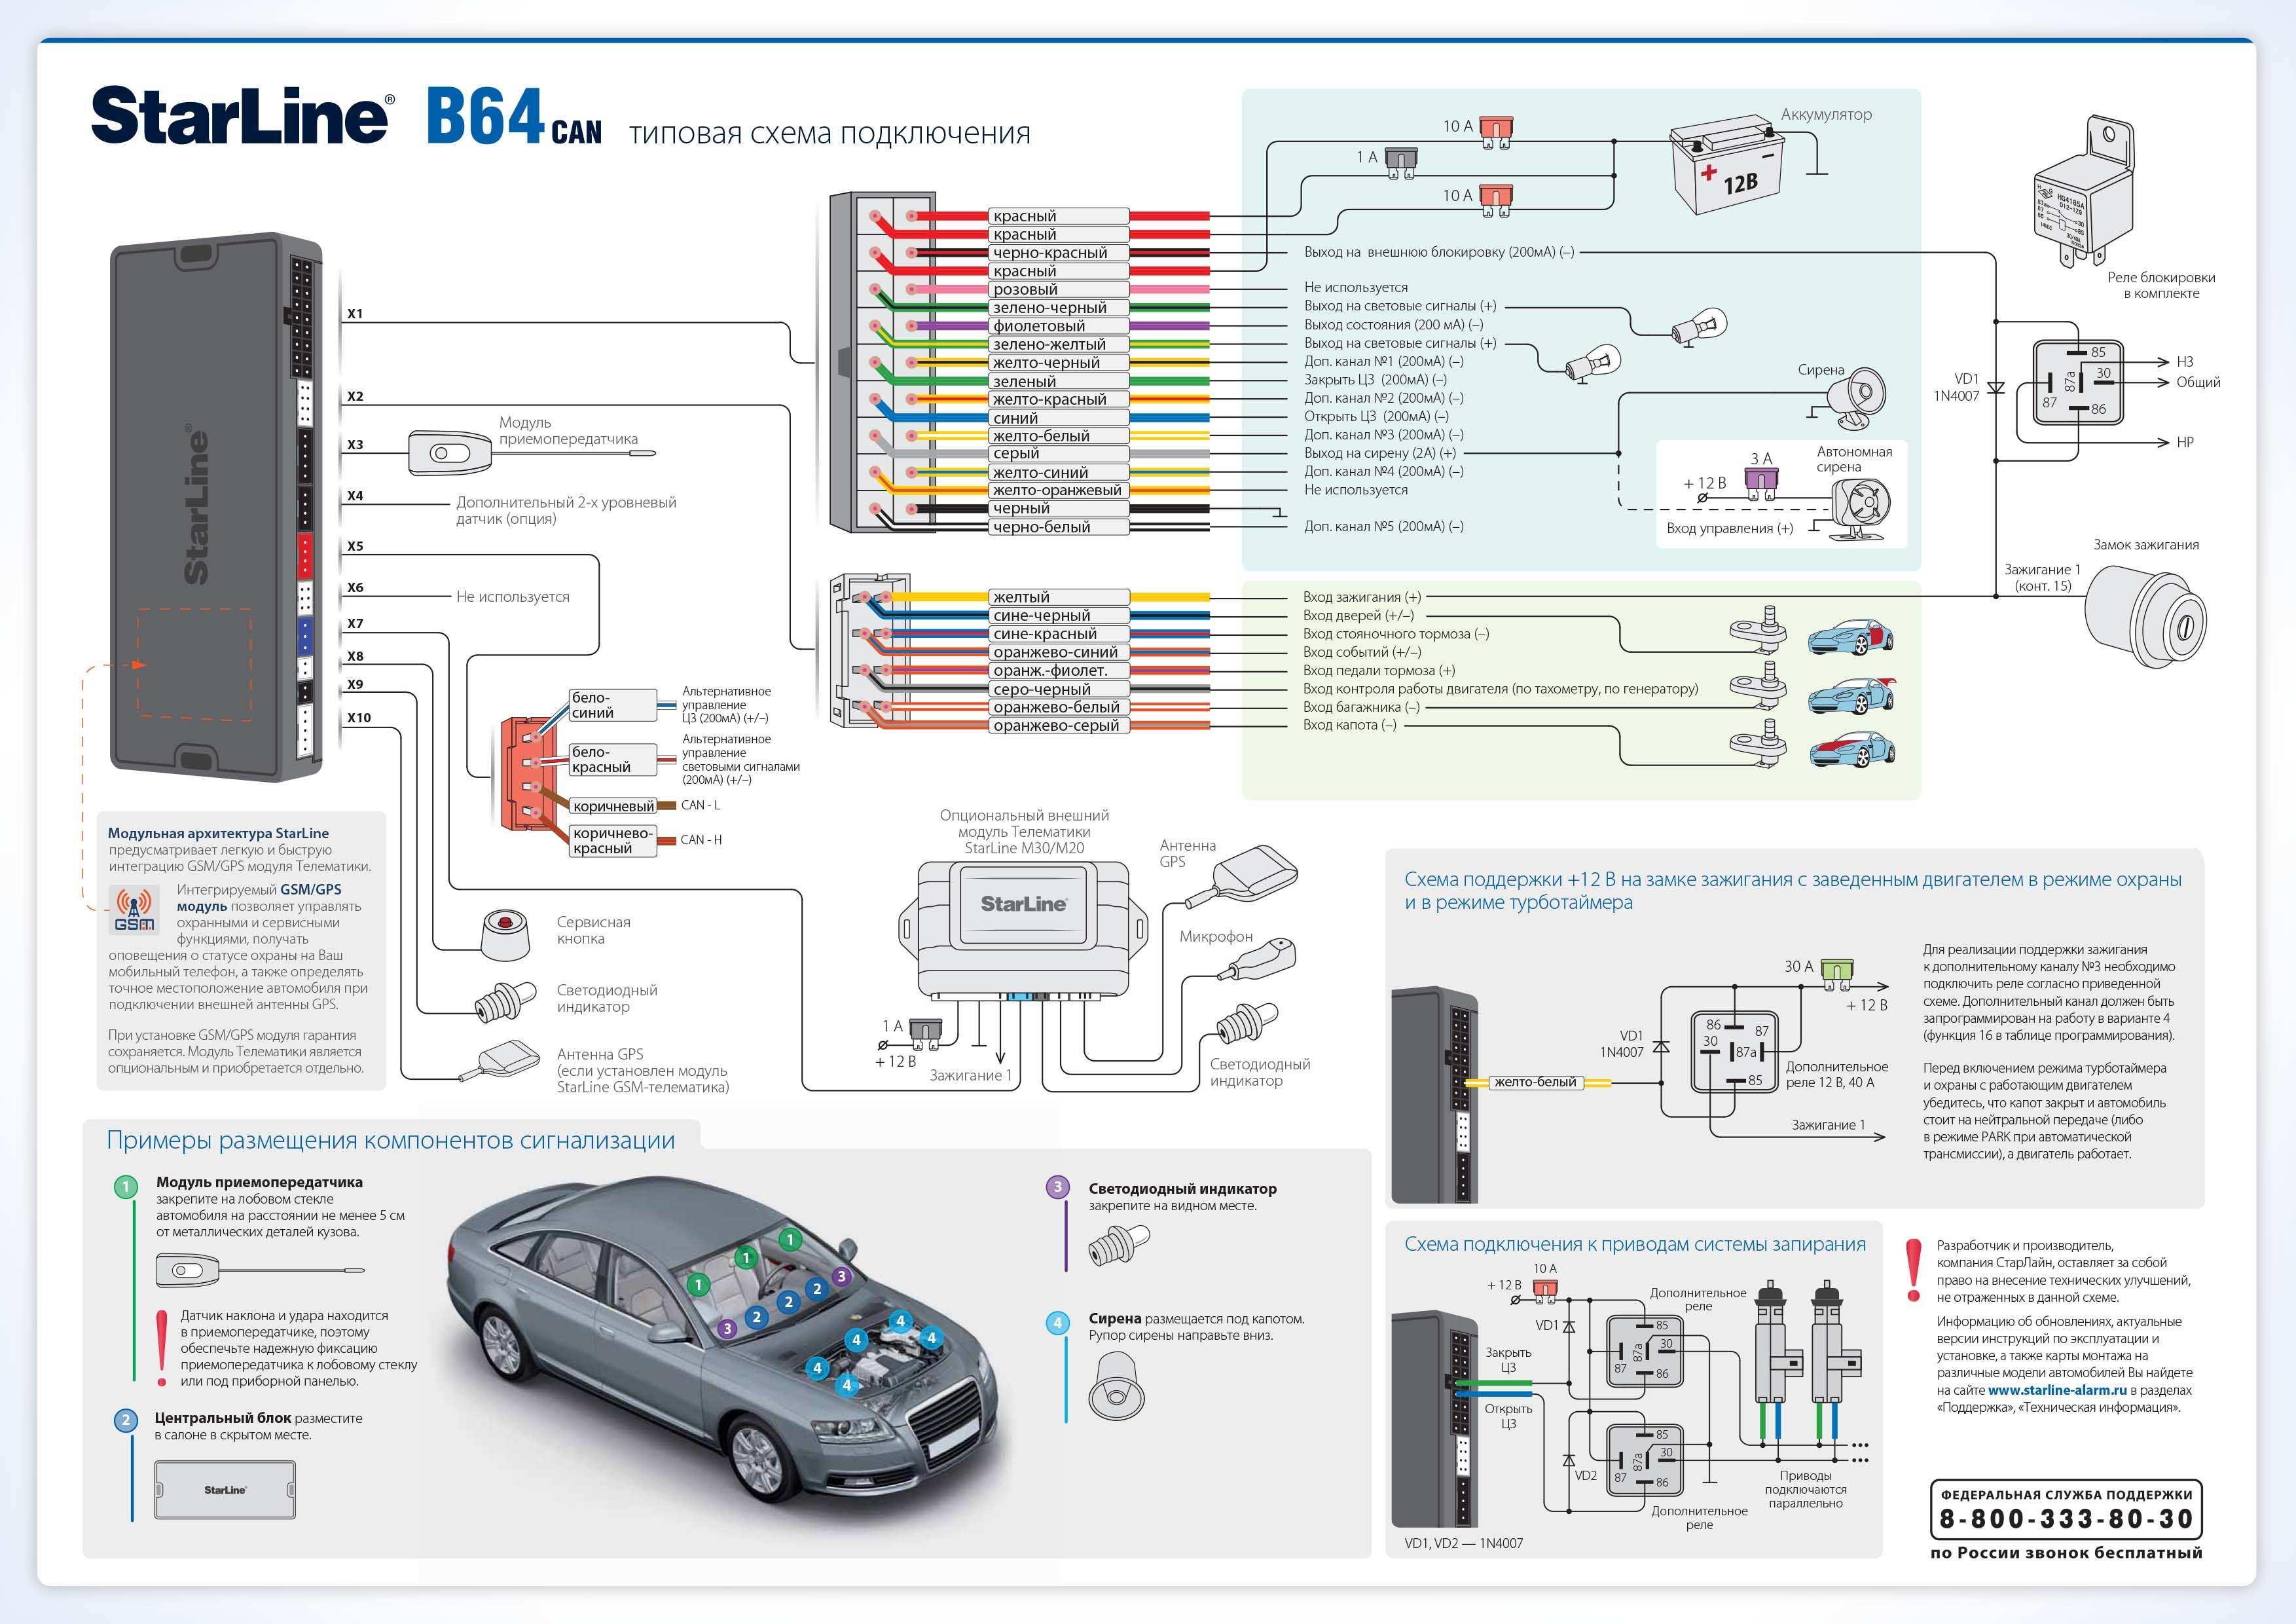 StarLine_B64 Схема подключения